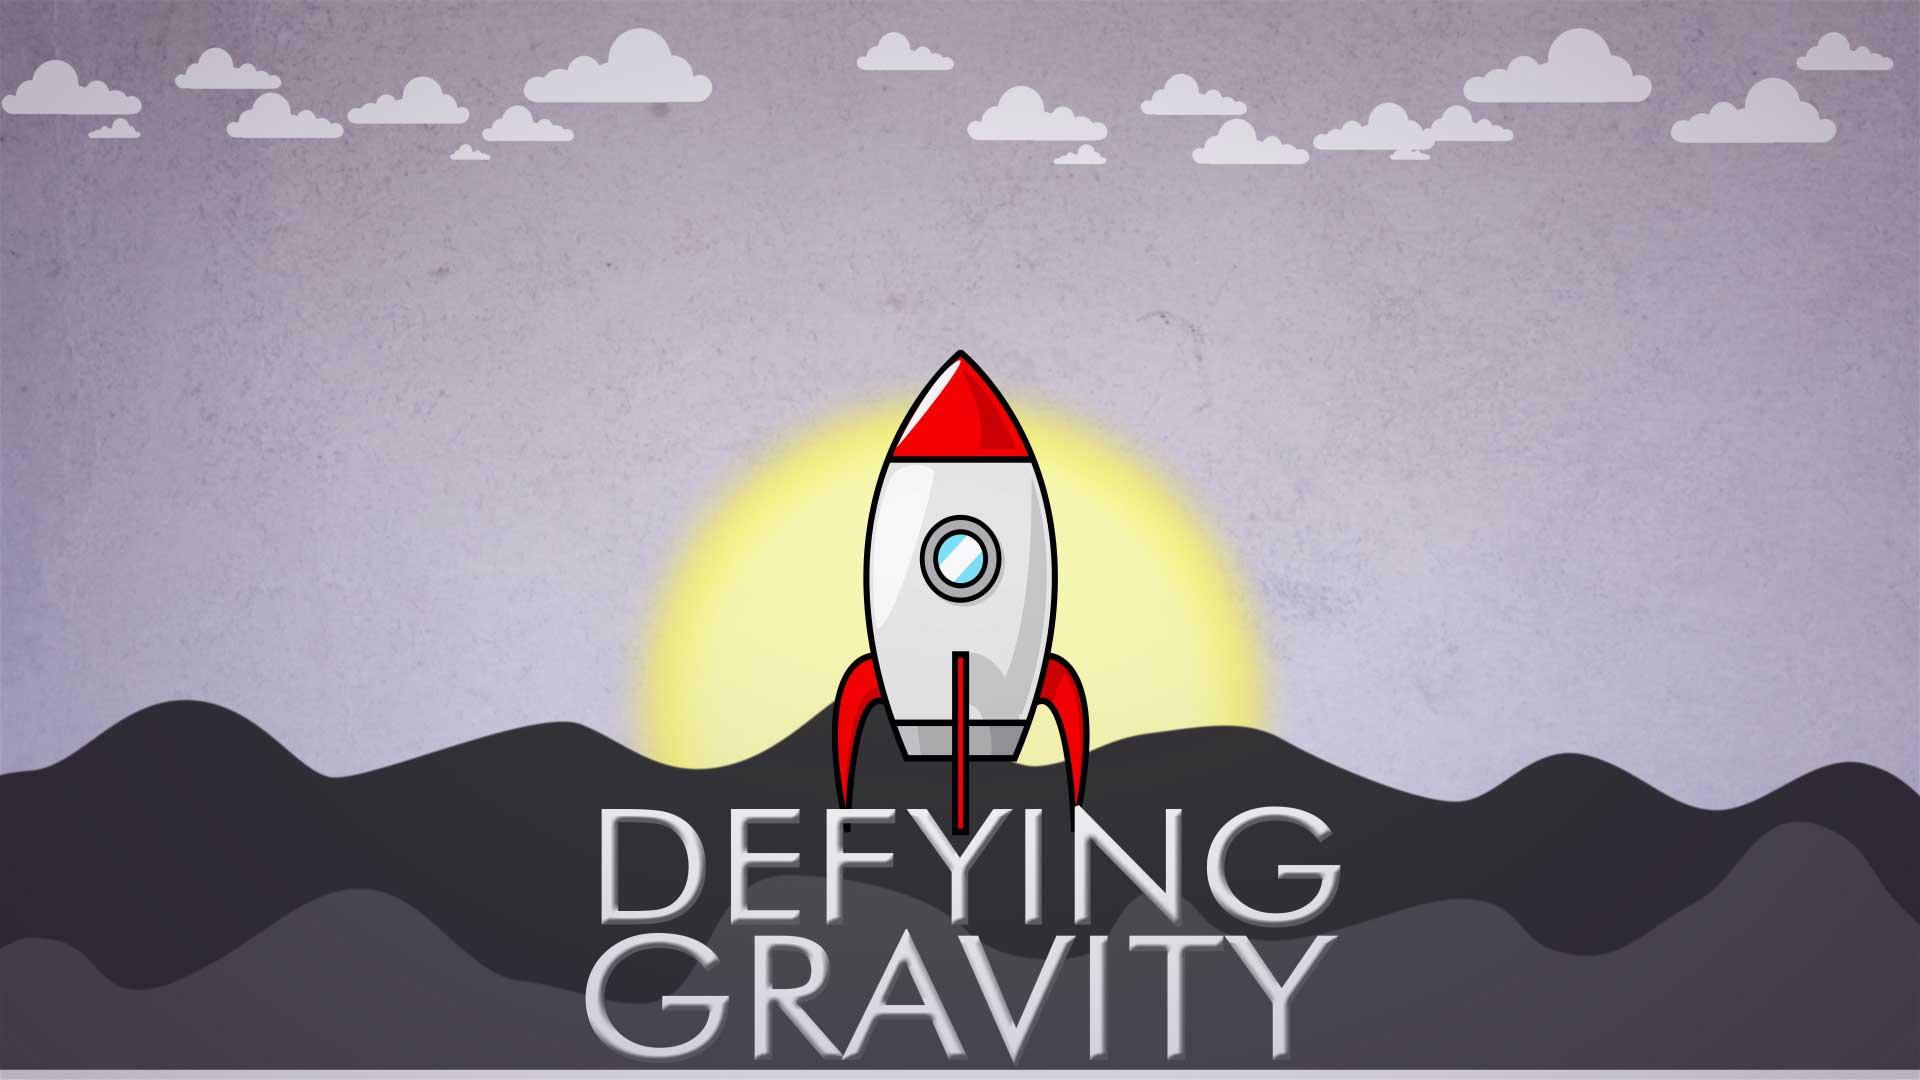 Defying-Gravity-Series-Graphic-WEB.jpg